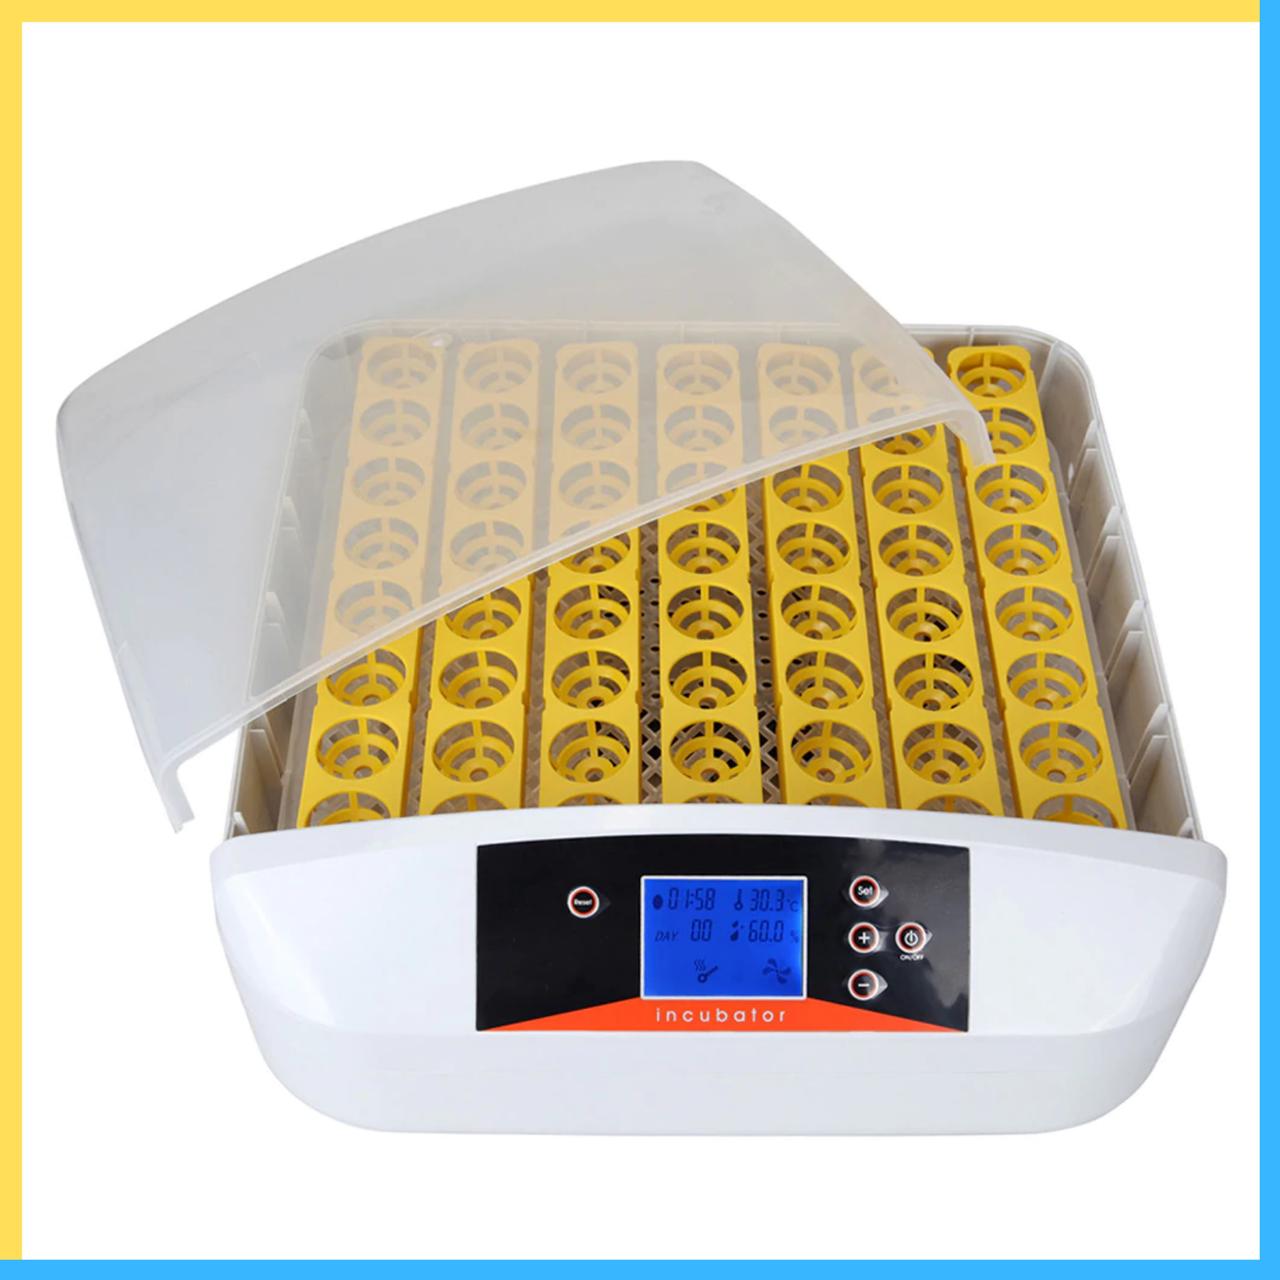 Инкубатор автоматический HHD 56a (цифровой терморегулятор) автоматический переворот